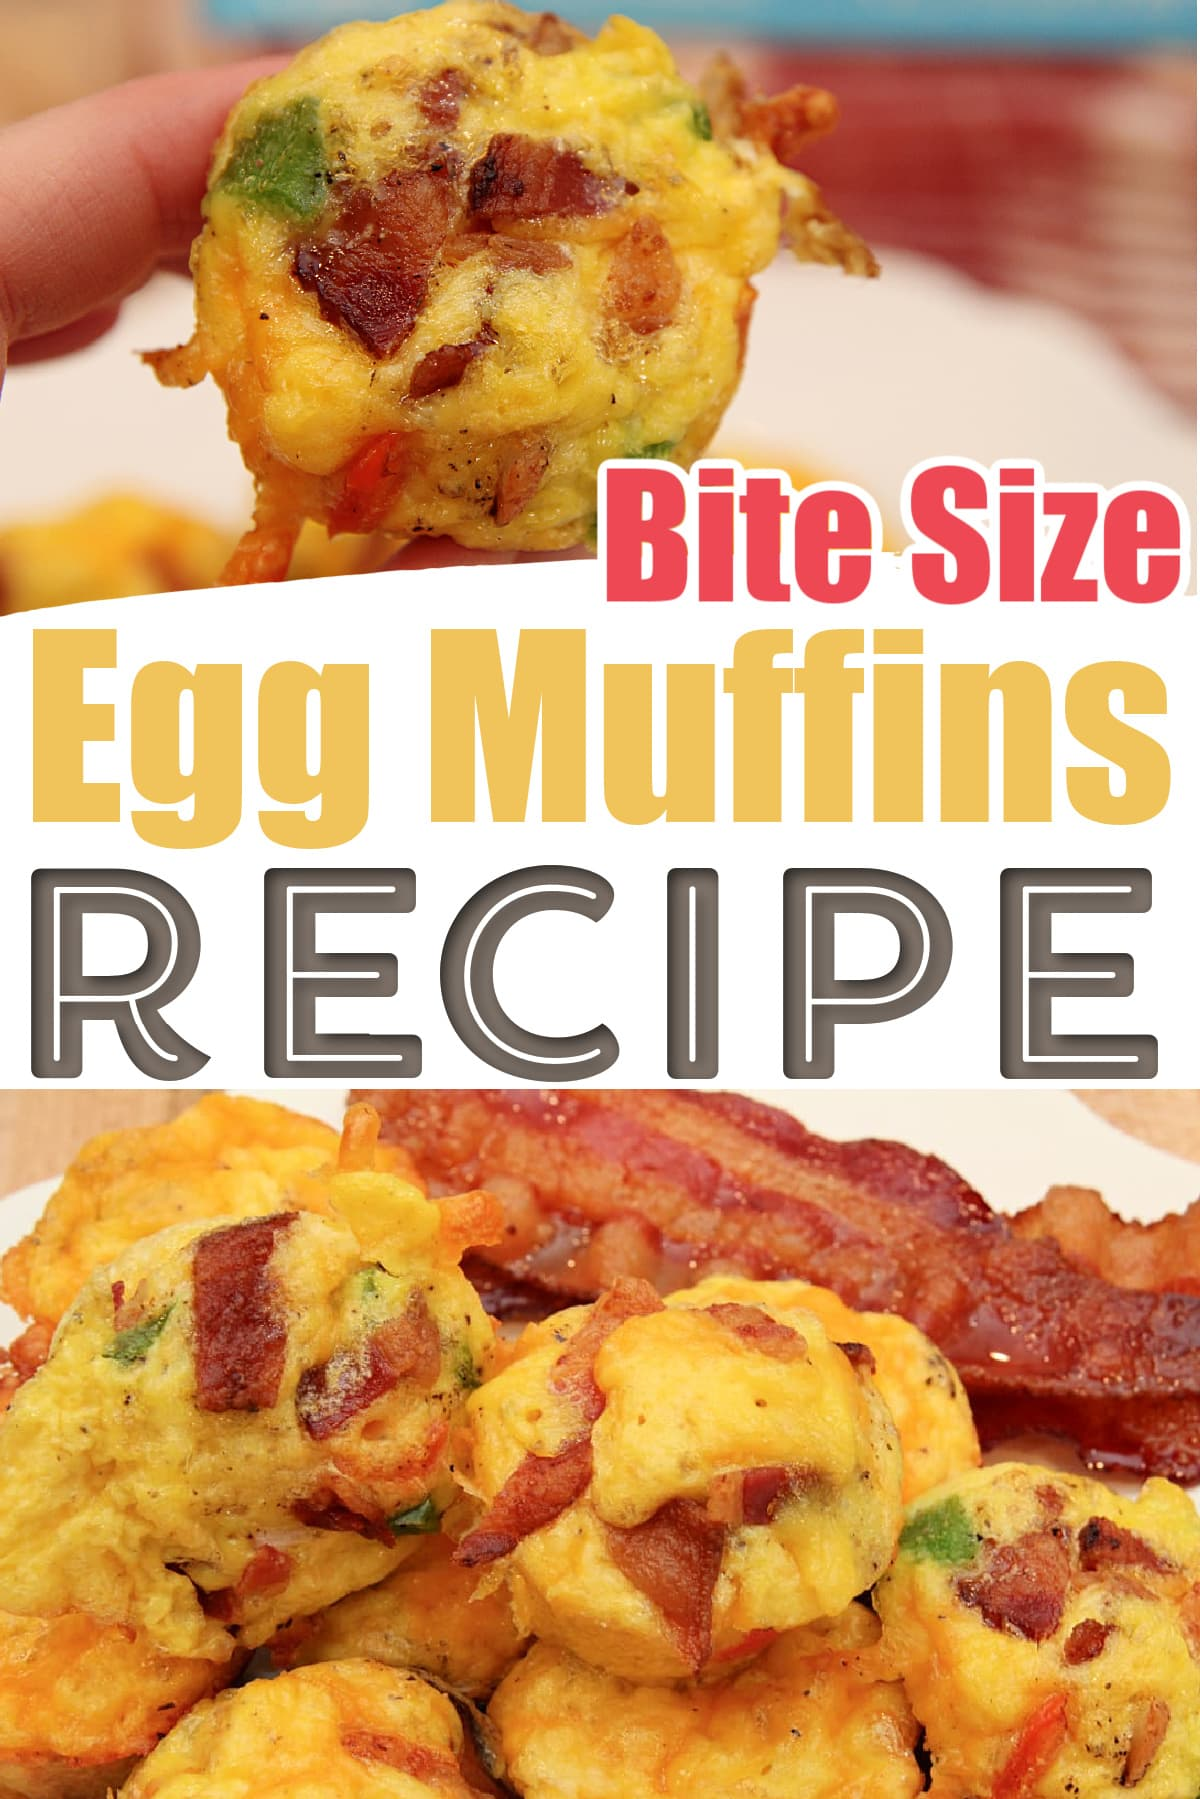 Bite Size Egg Muffins Recipe